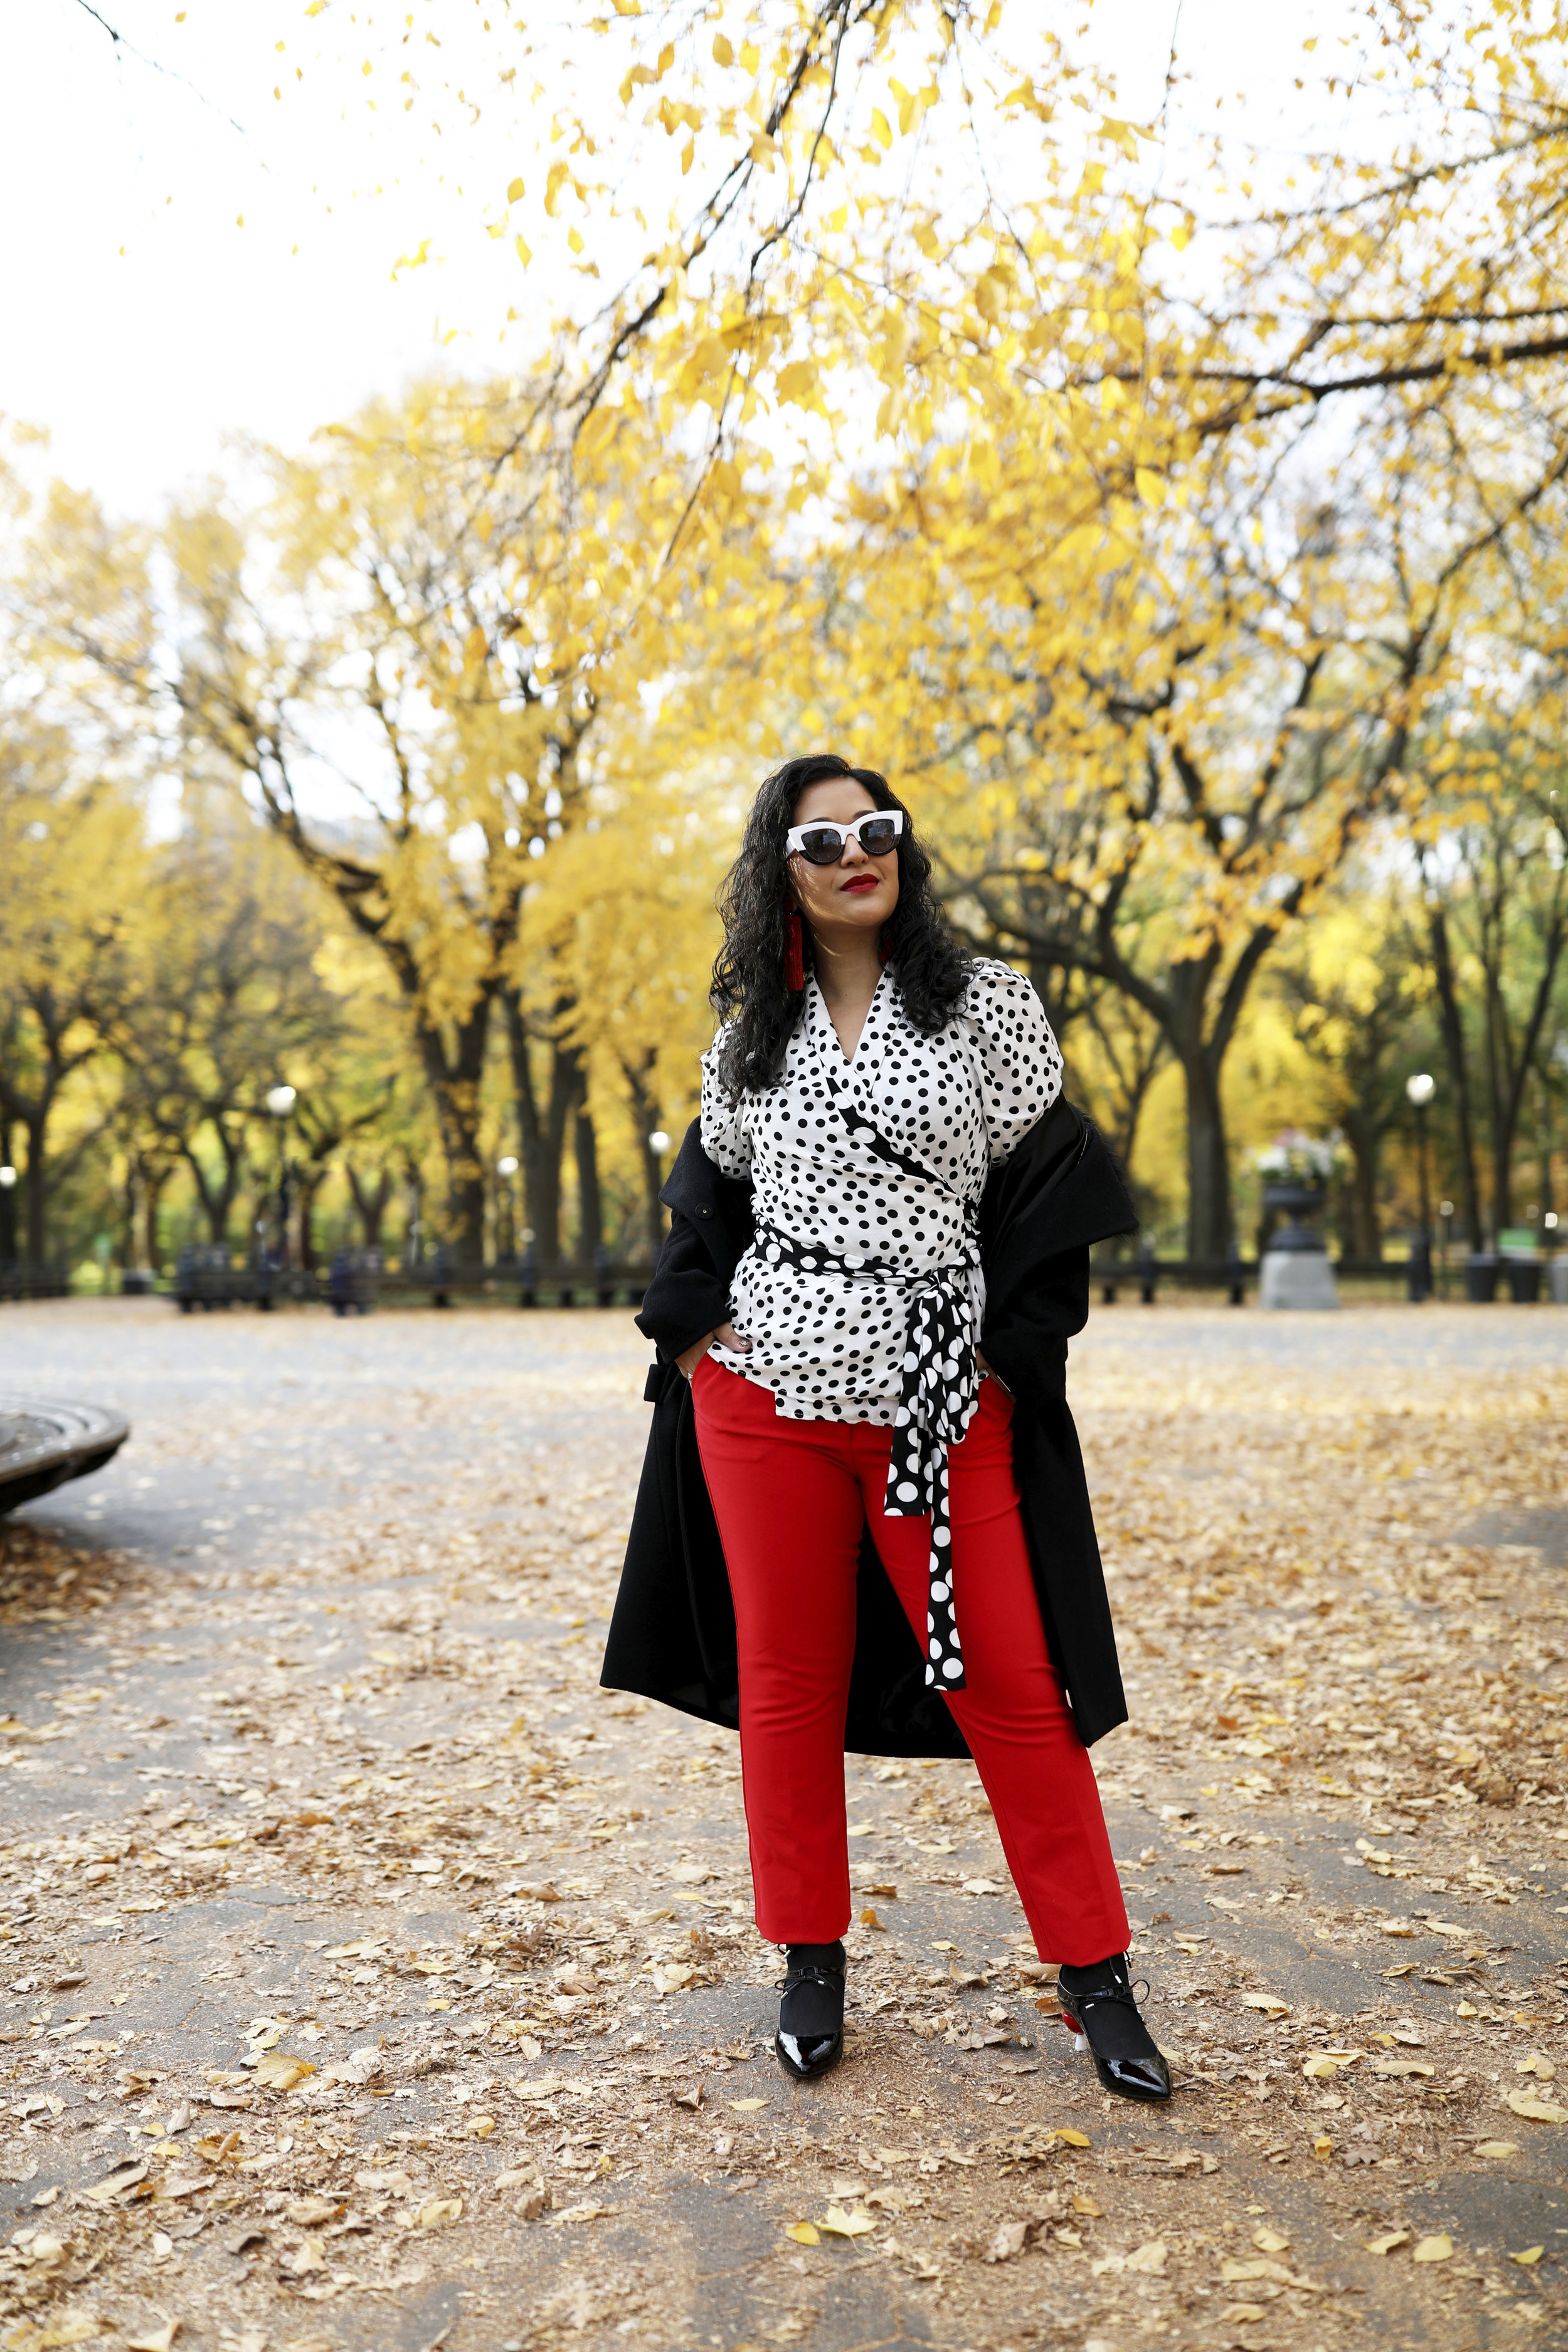 Krity S x Fall Work Outfit x Polka Dot2.jpg